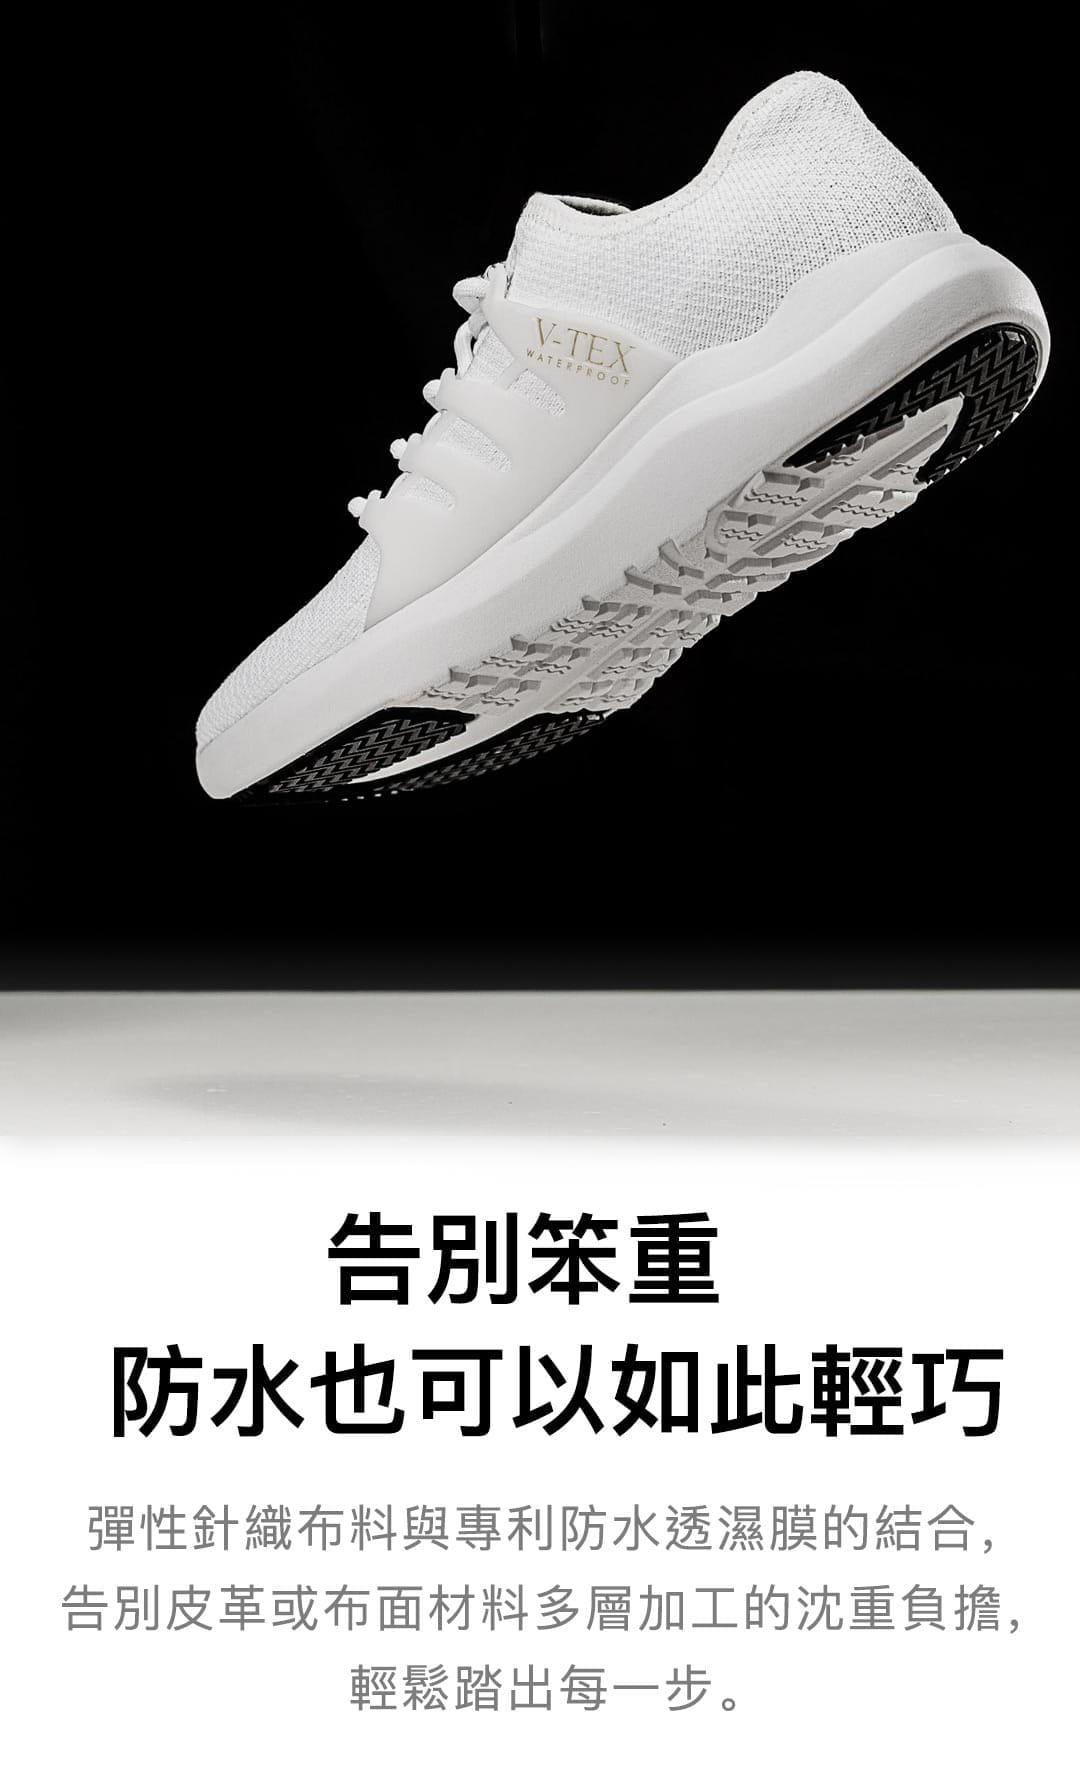 【V-TEX 地表最強防水鞋】【V-TEX機能防水鞋】 雙11優選款式 (3款任選) 16